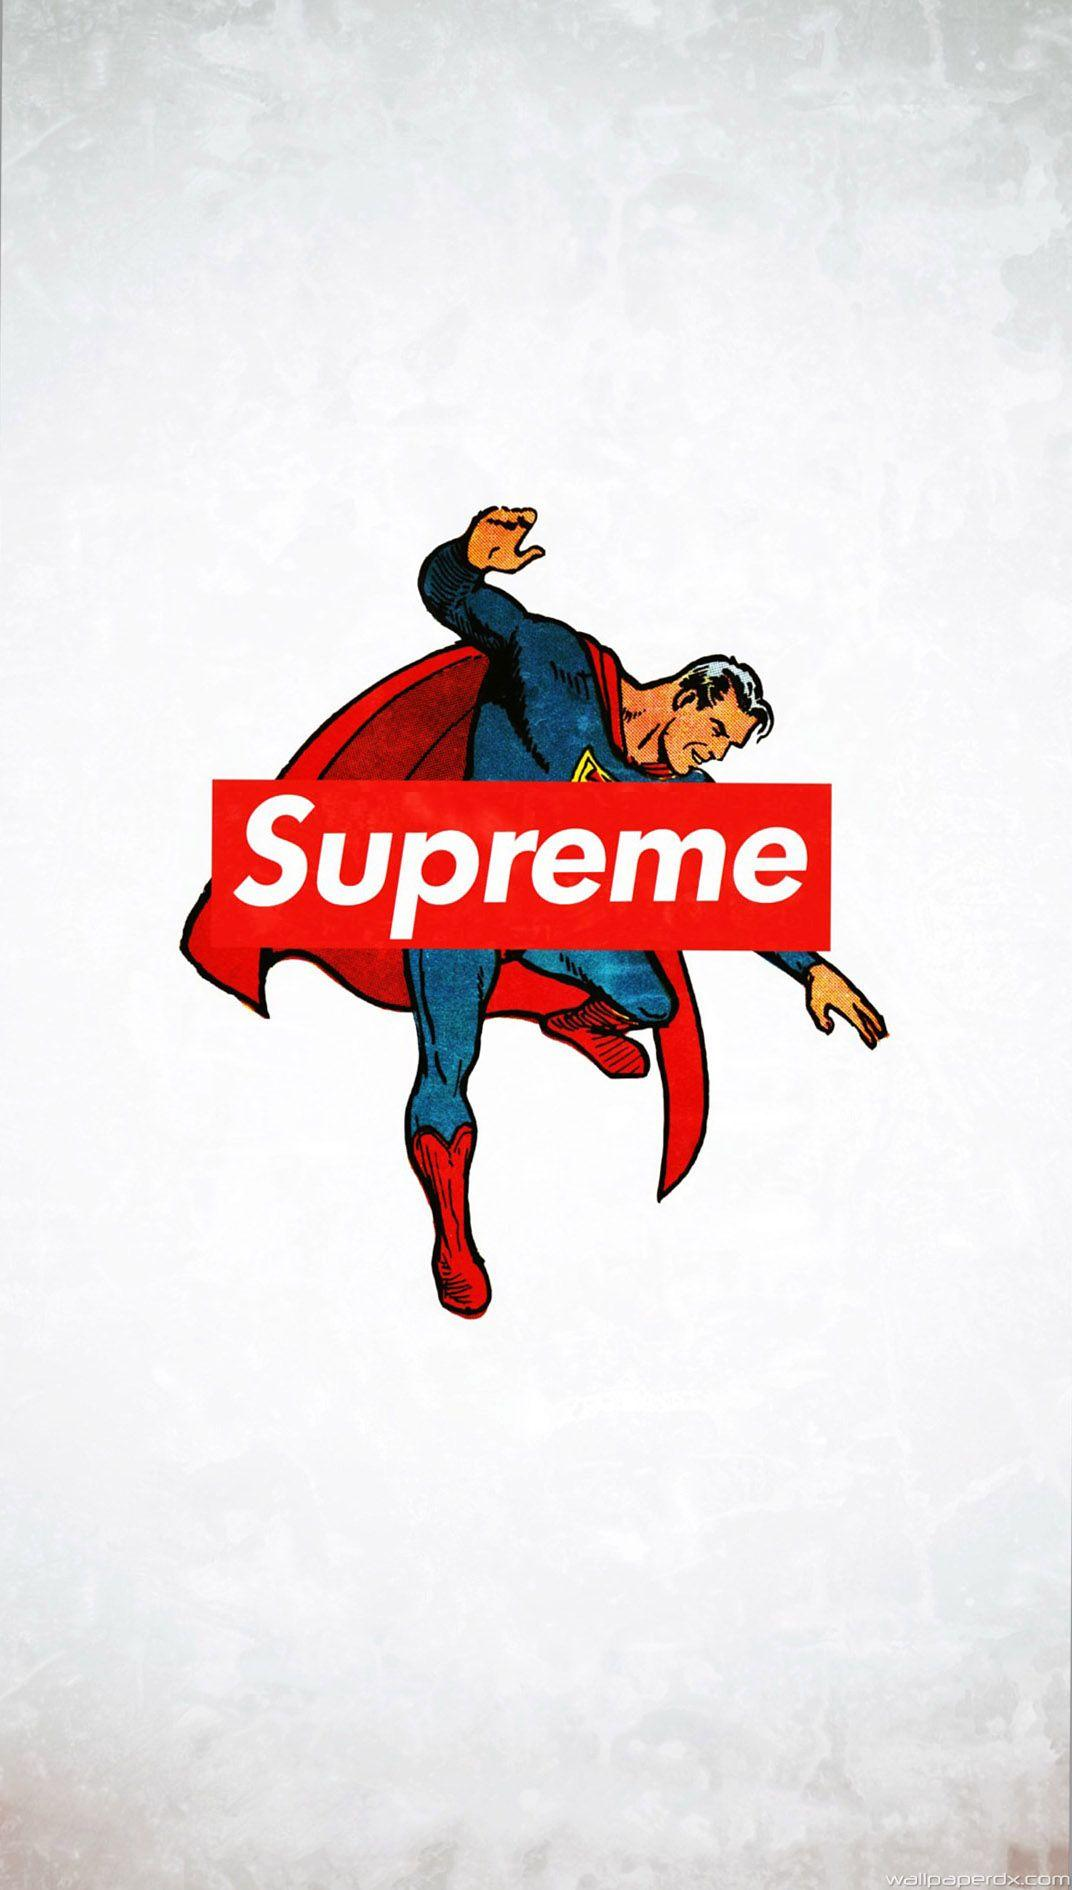 Supreme Logo Wallpapers - Wallpaper Cave